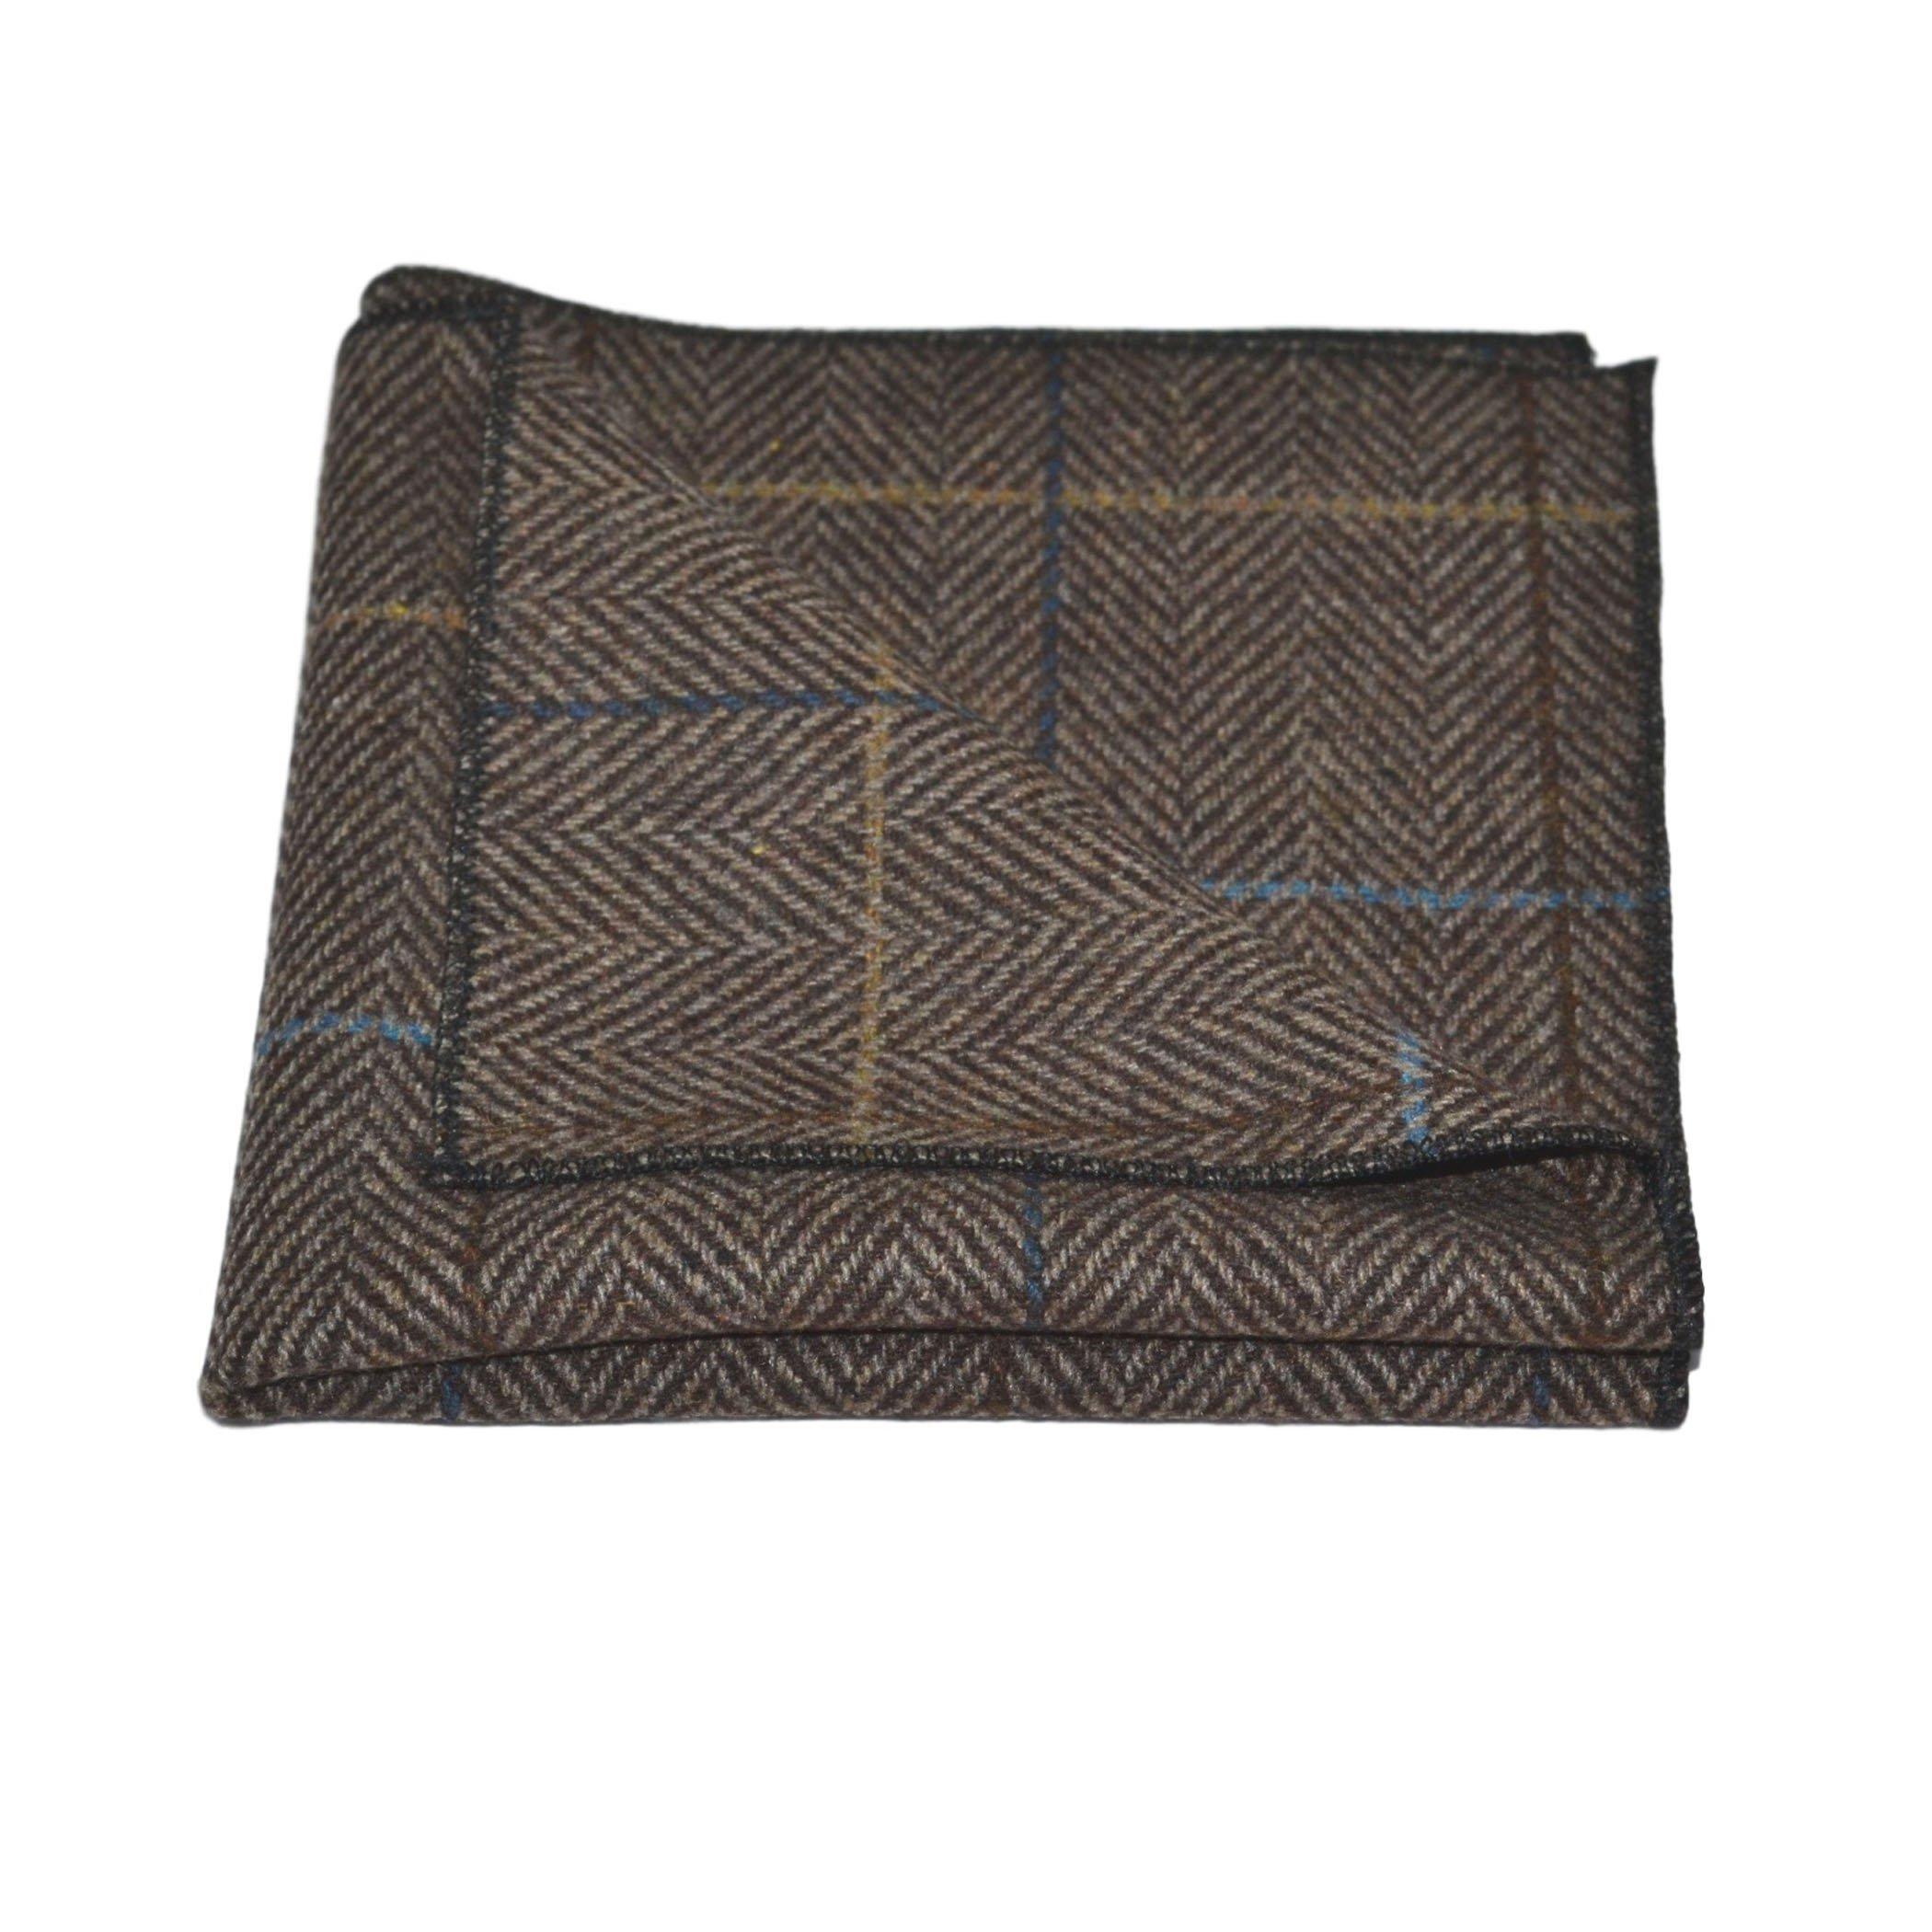 Luxury Walnut Brown Tweed Pocket Square, Handkerchief